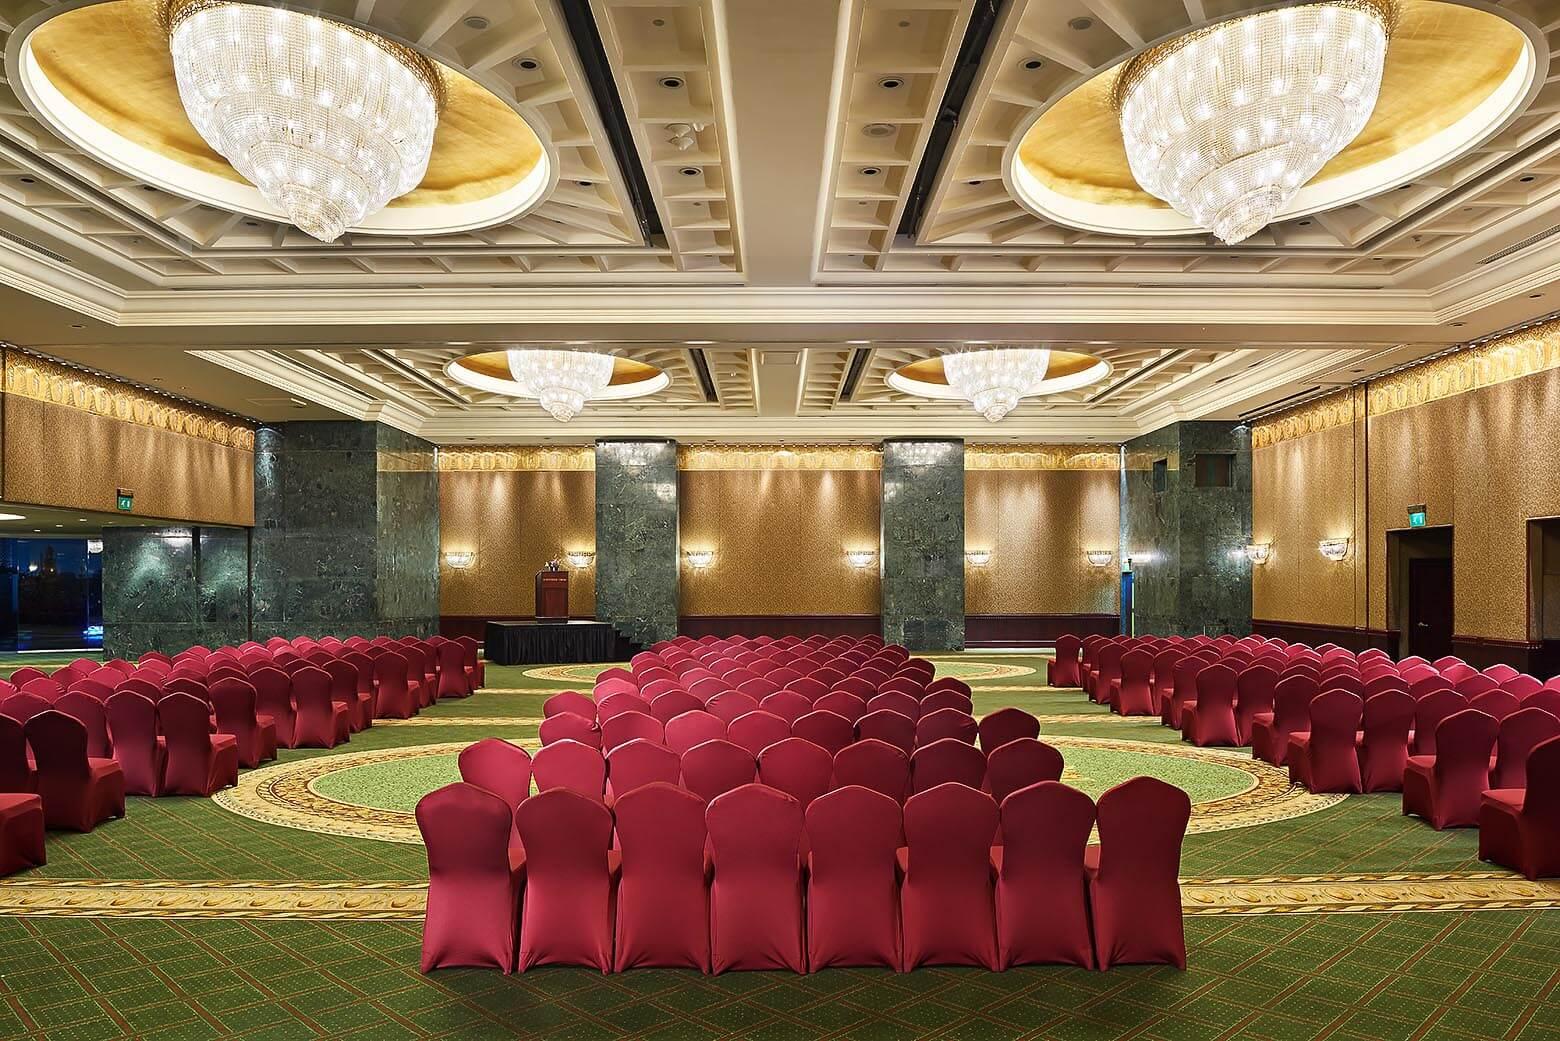 Farhaty ballroom Theater style - Grand Nile Tower hotel